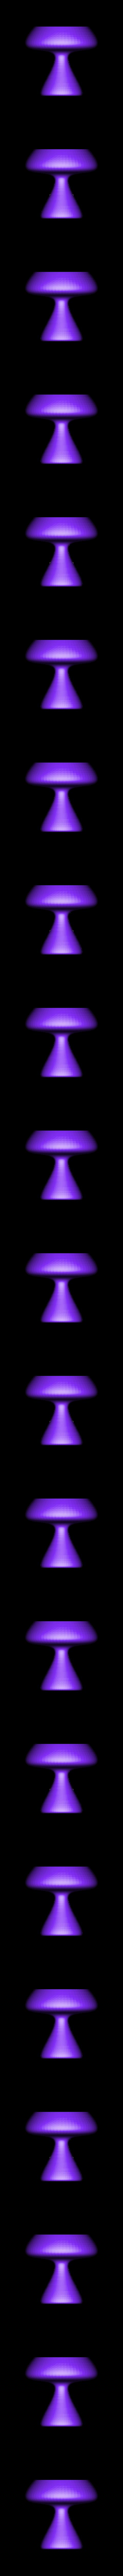 Verre Champignon.STL Download free STL file Mushroom glass • 3D printable design, Yoyos